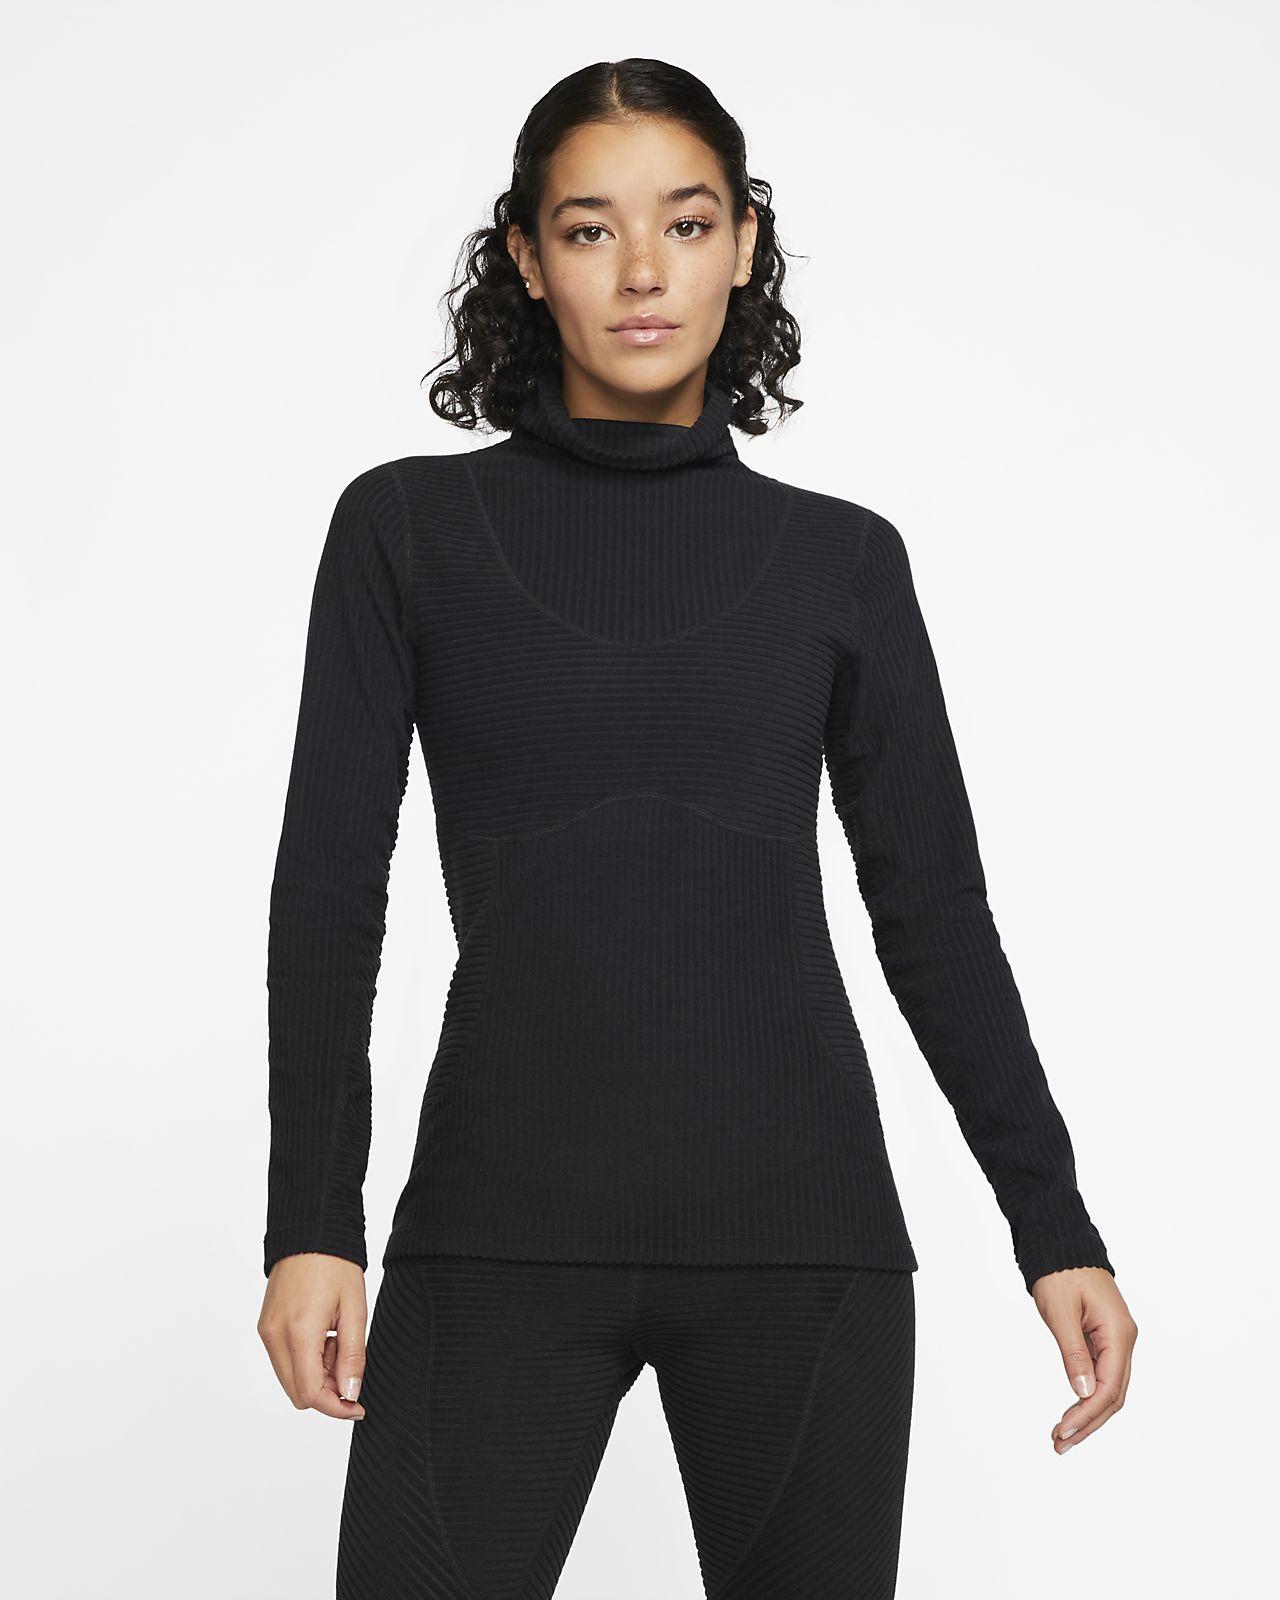 Parte superior de tejido velour para mujer Nike Pro HyperWarm